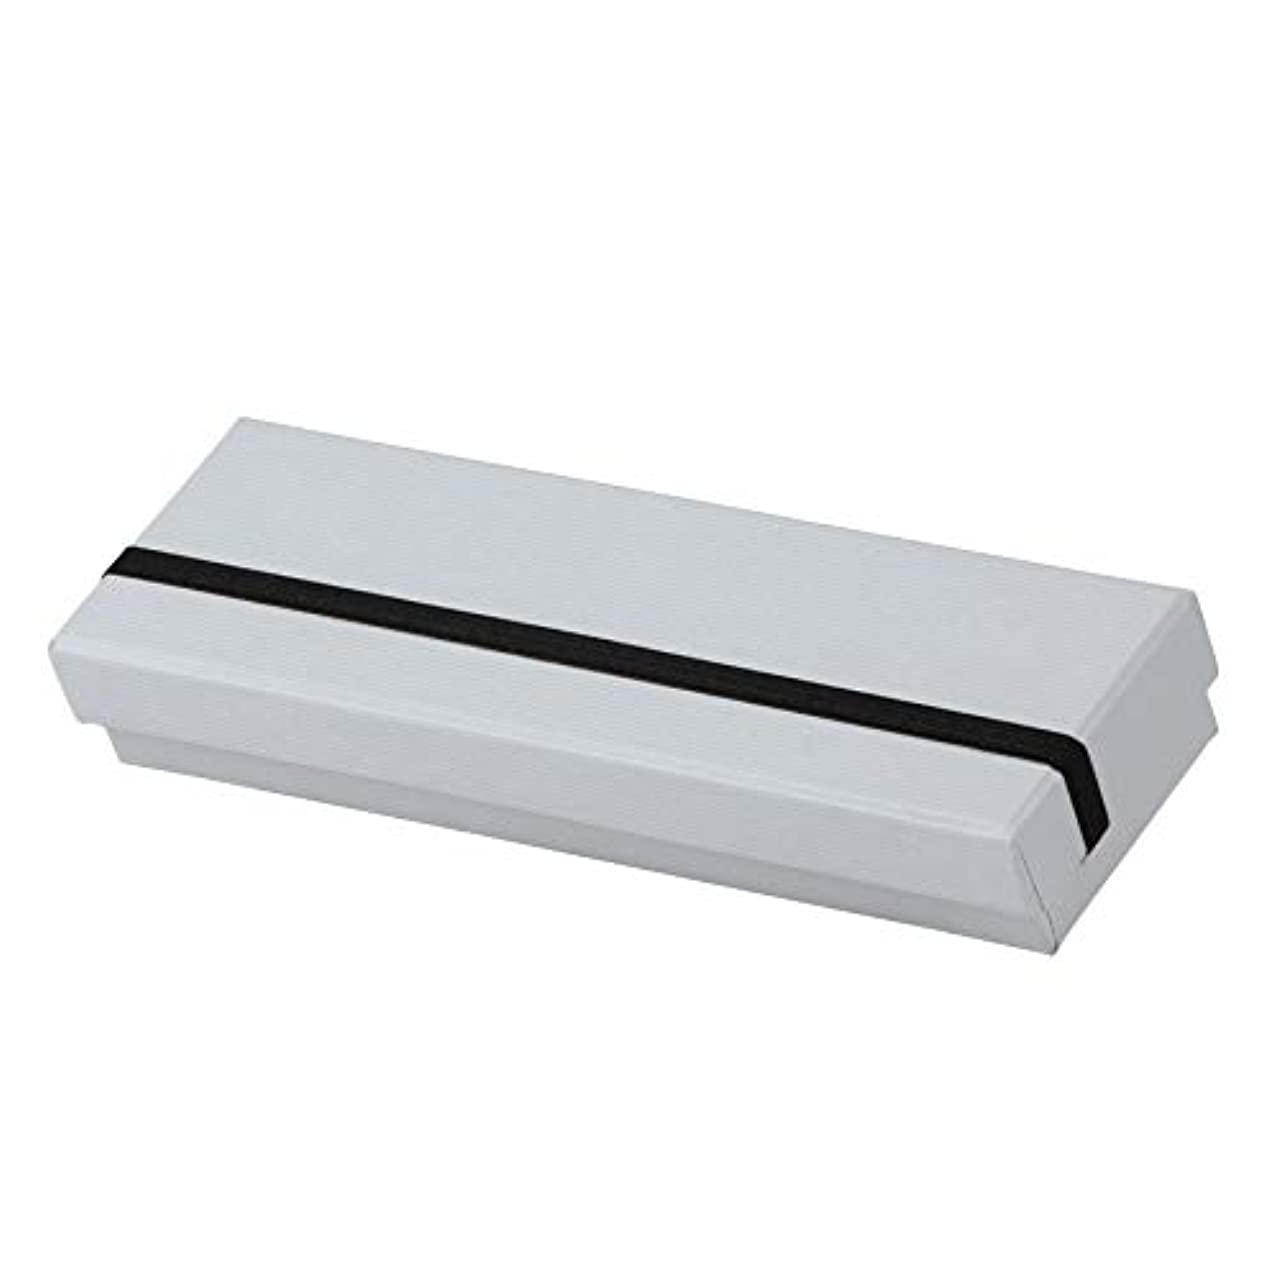 R??ssler Soho Pencil Box with Elasticated Strap - Neutral